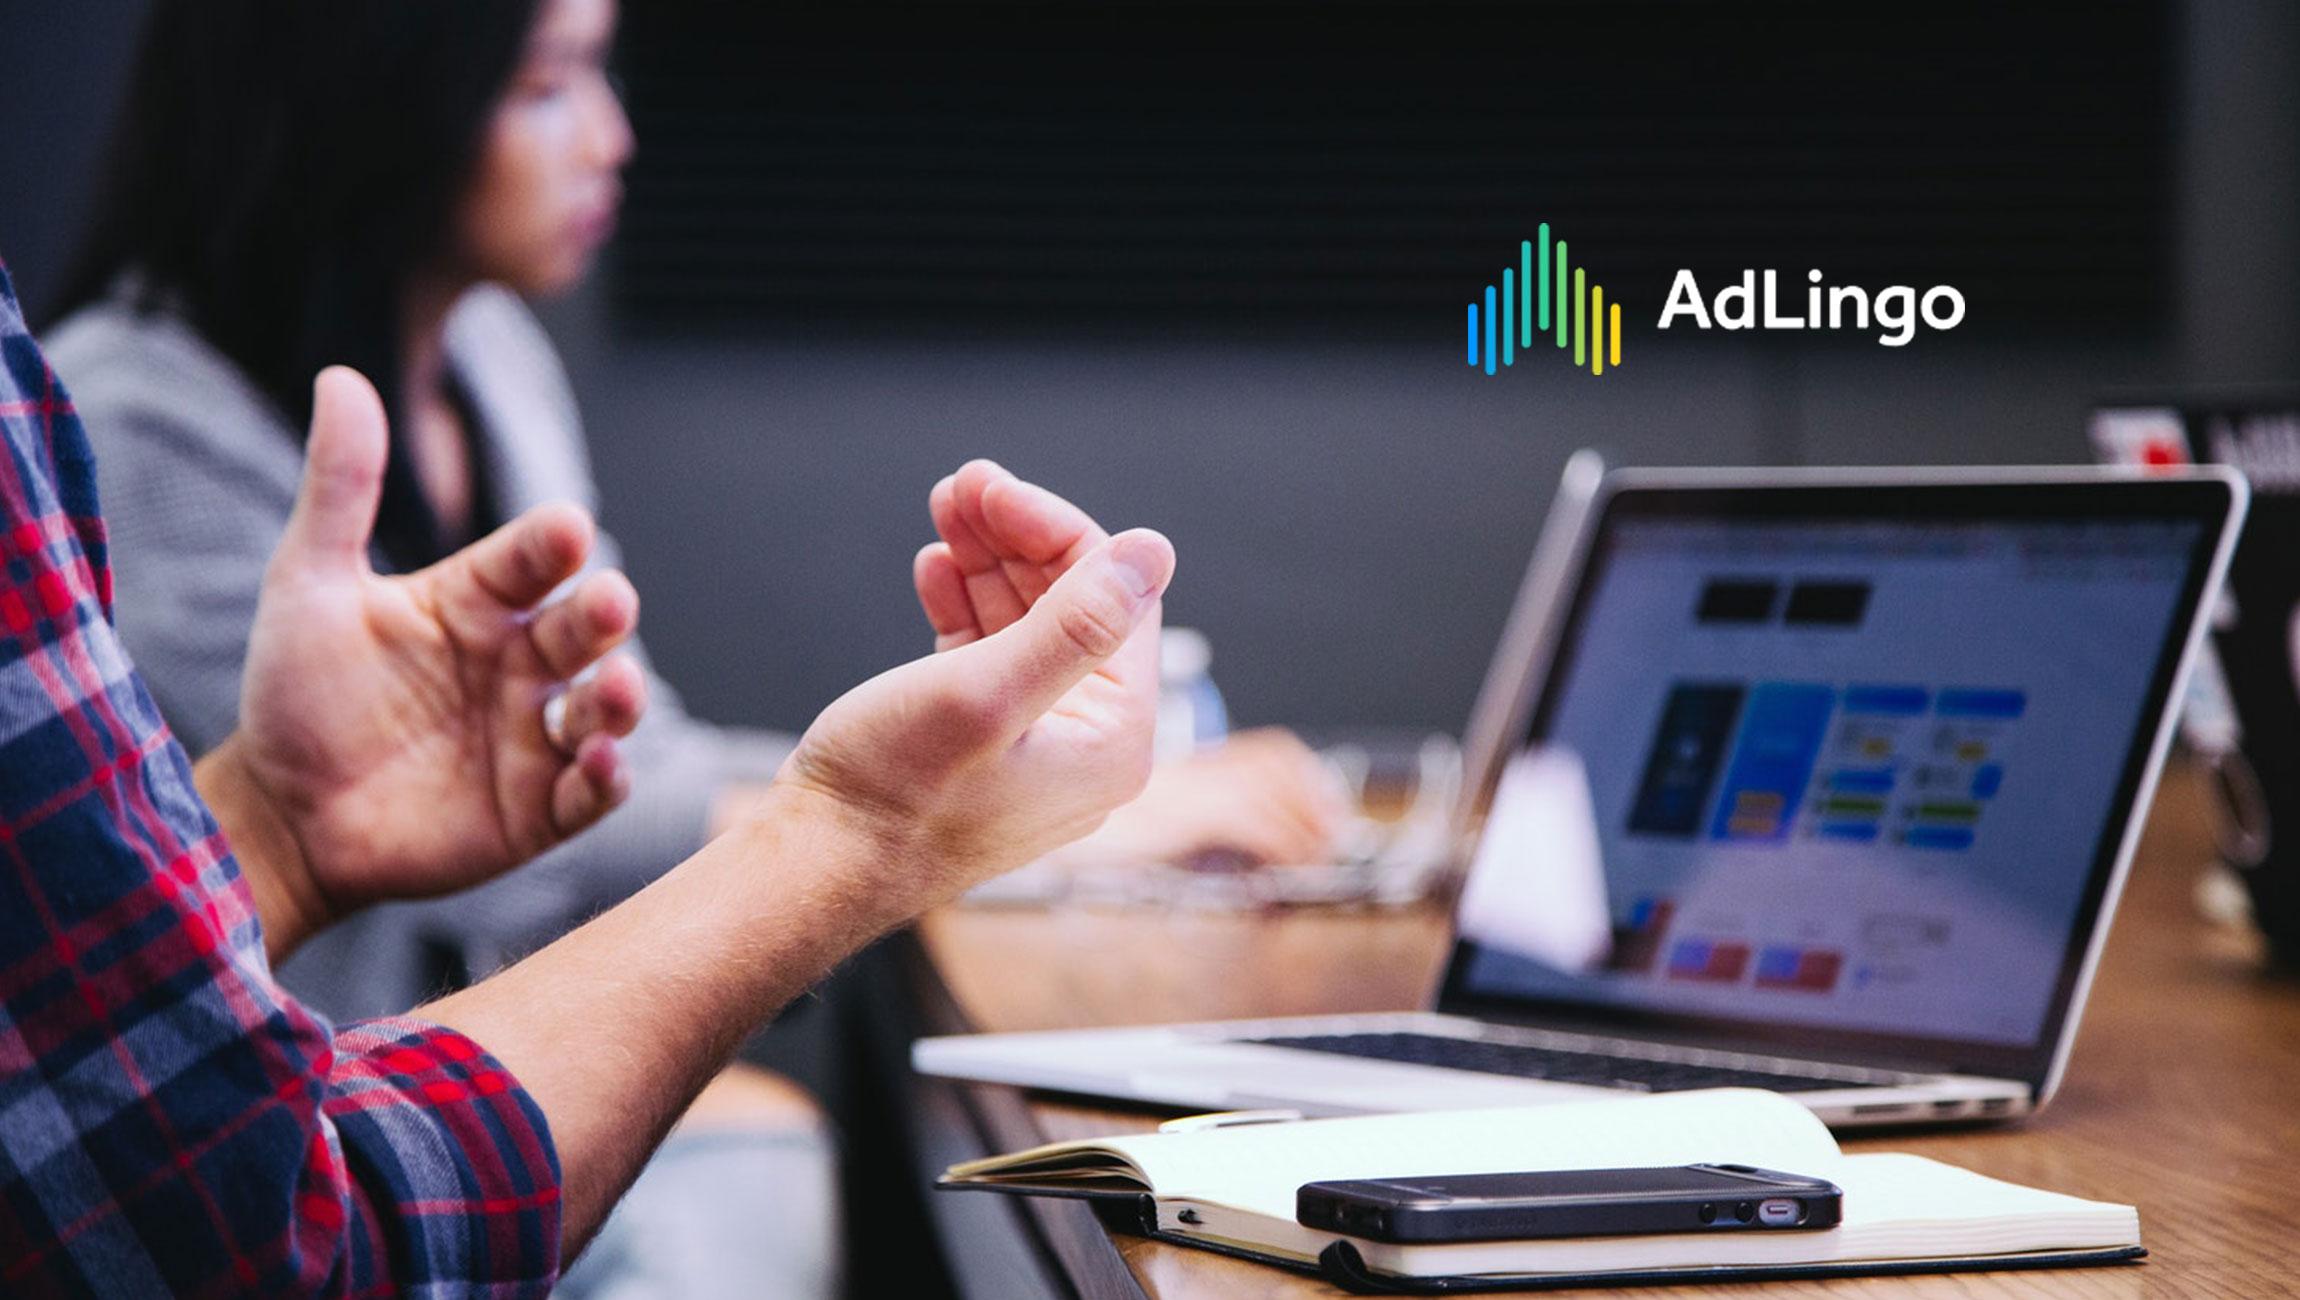 Adlingo meet adlingo, a new marketing platform that connects consumers